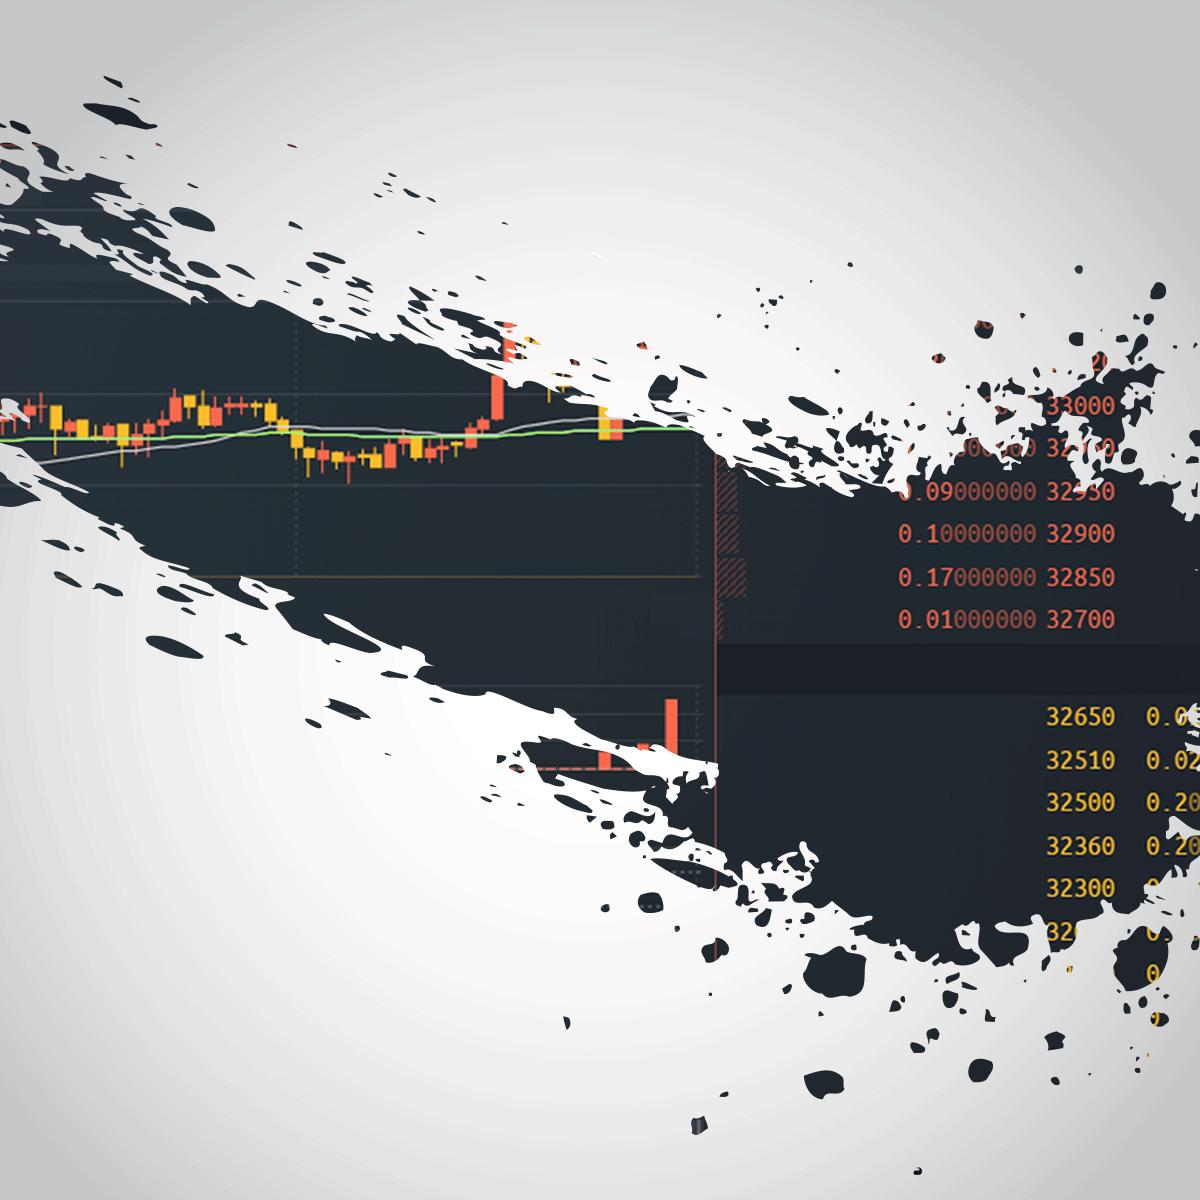 test ツイッターメディア - bitFlyerの仲値 = ¥988,550 1BTC販売価格 = ¥973,650 1BTC買取価格 = ¥1,003,450 (2020年07月15日 22時19分45秒) #ビットフライヤー https://t.co/Dxgz56prbT